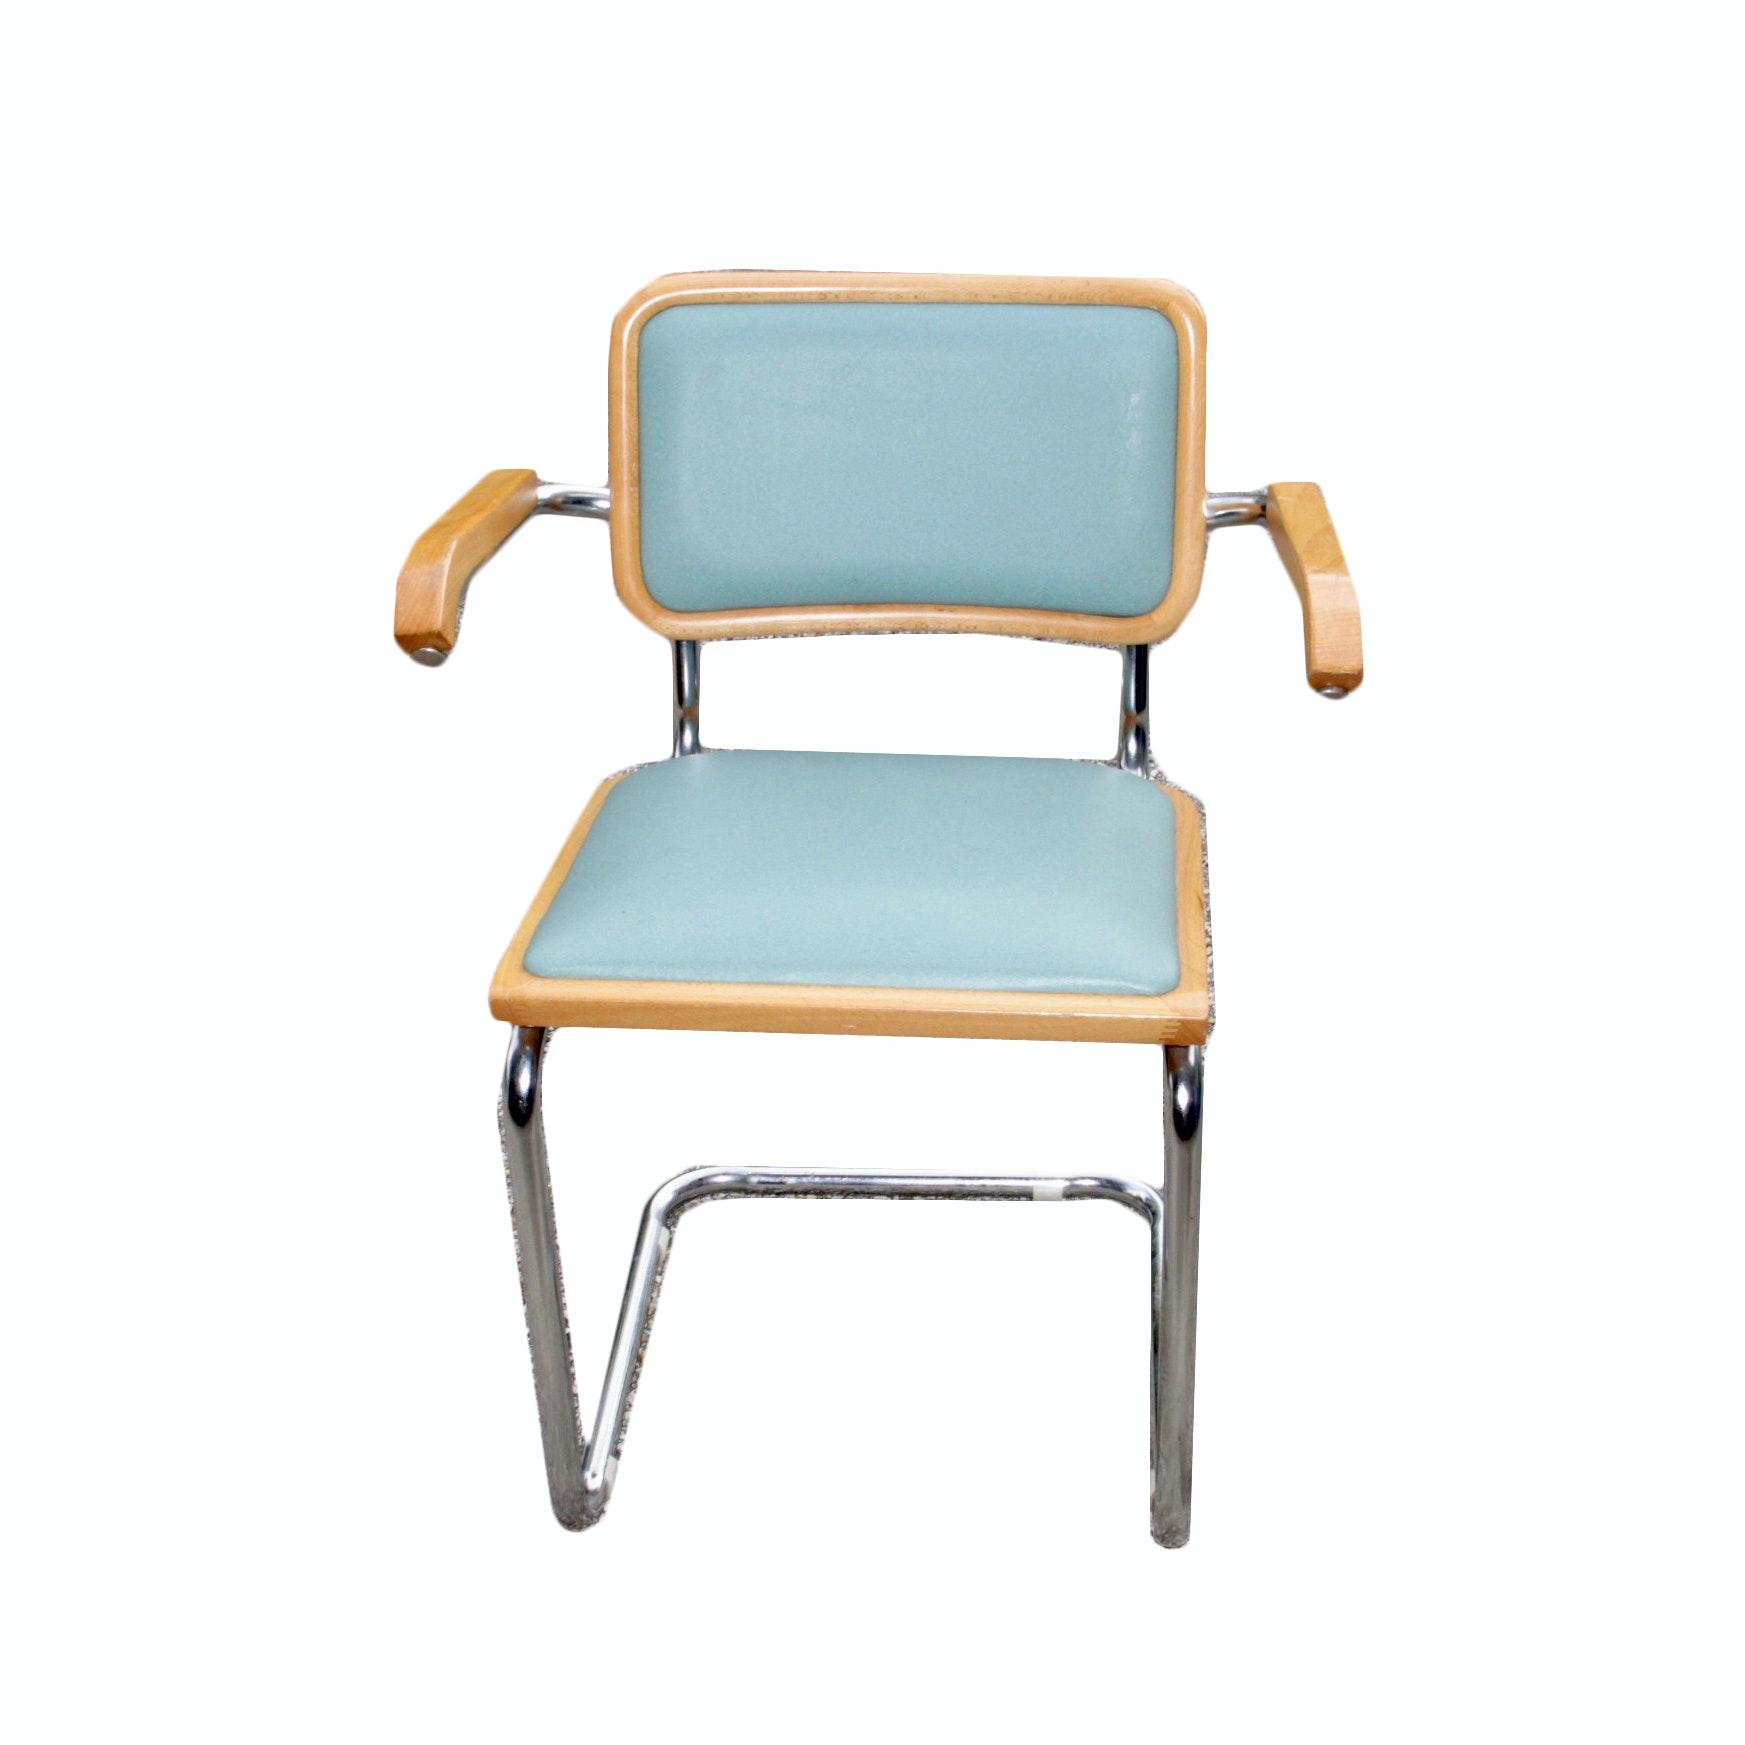 Vintage Mid-Century Cantilever Armchair